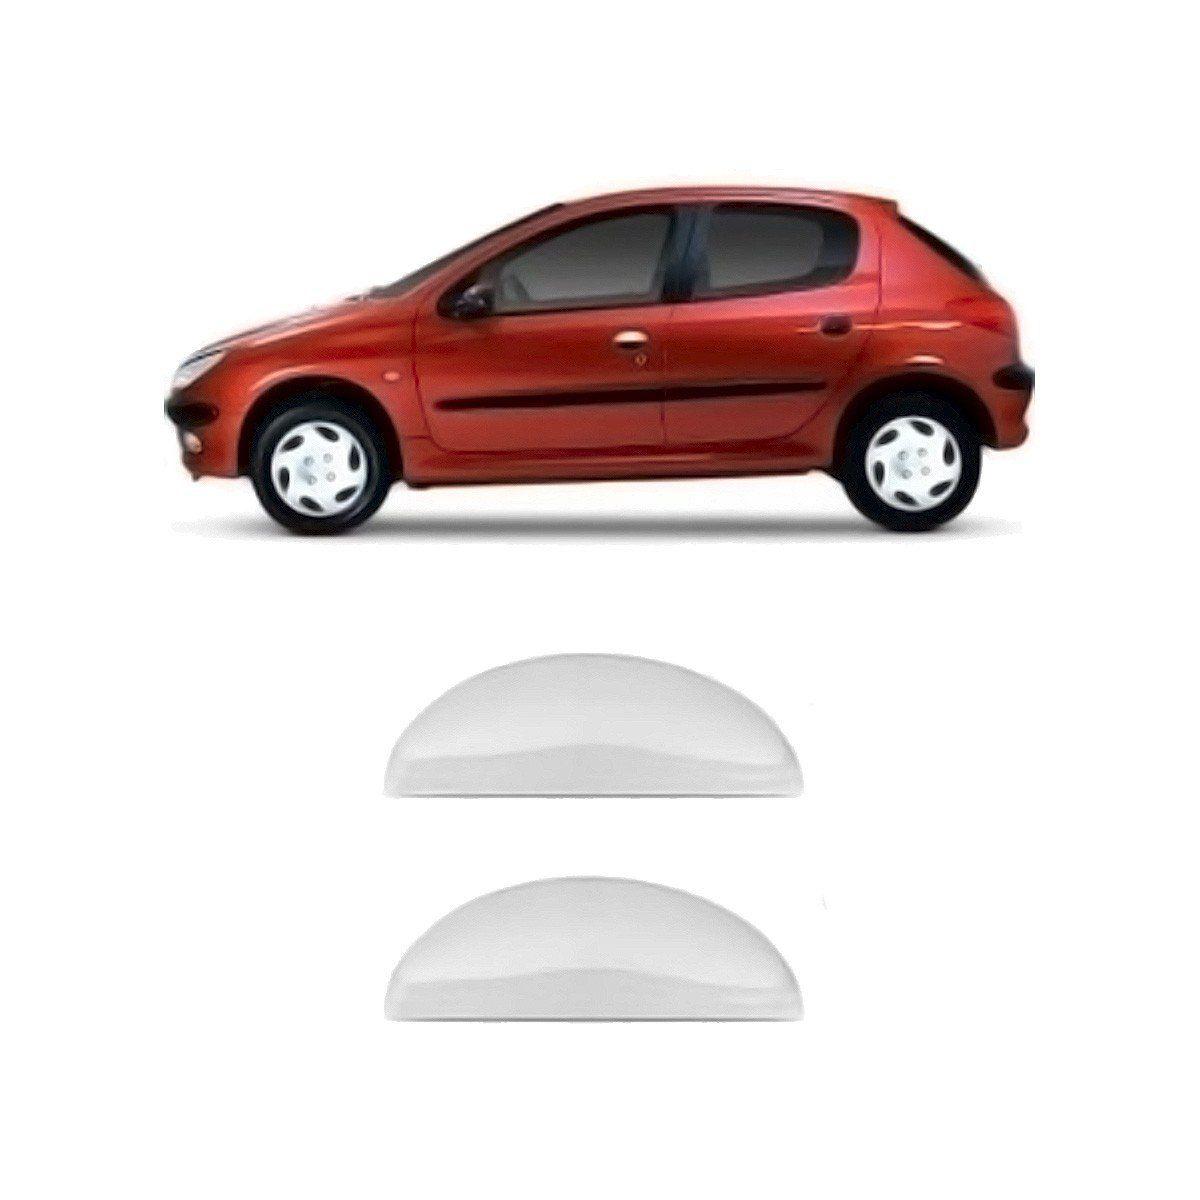 Capa de Maçaneta Peugeot 206 207 Cromada